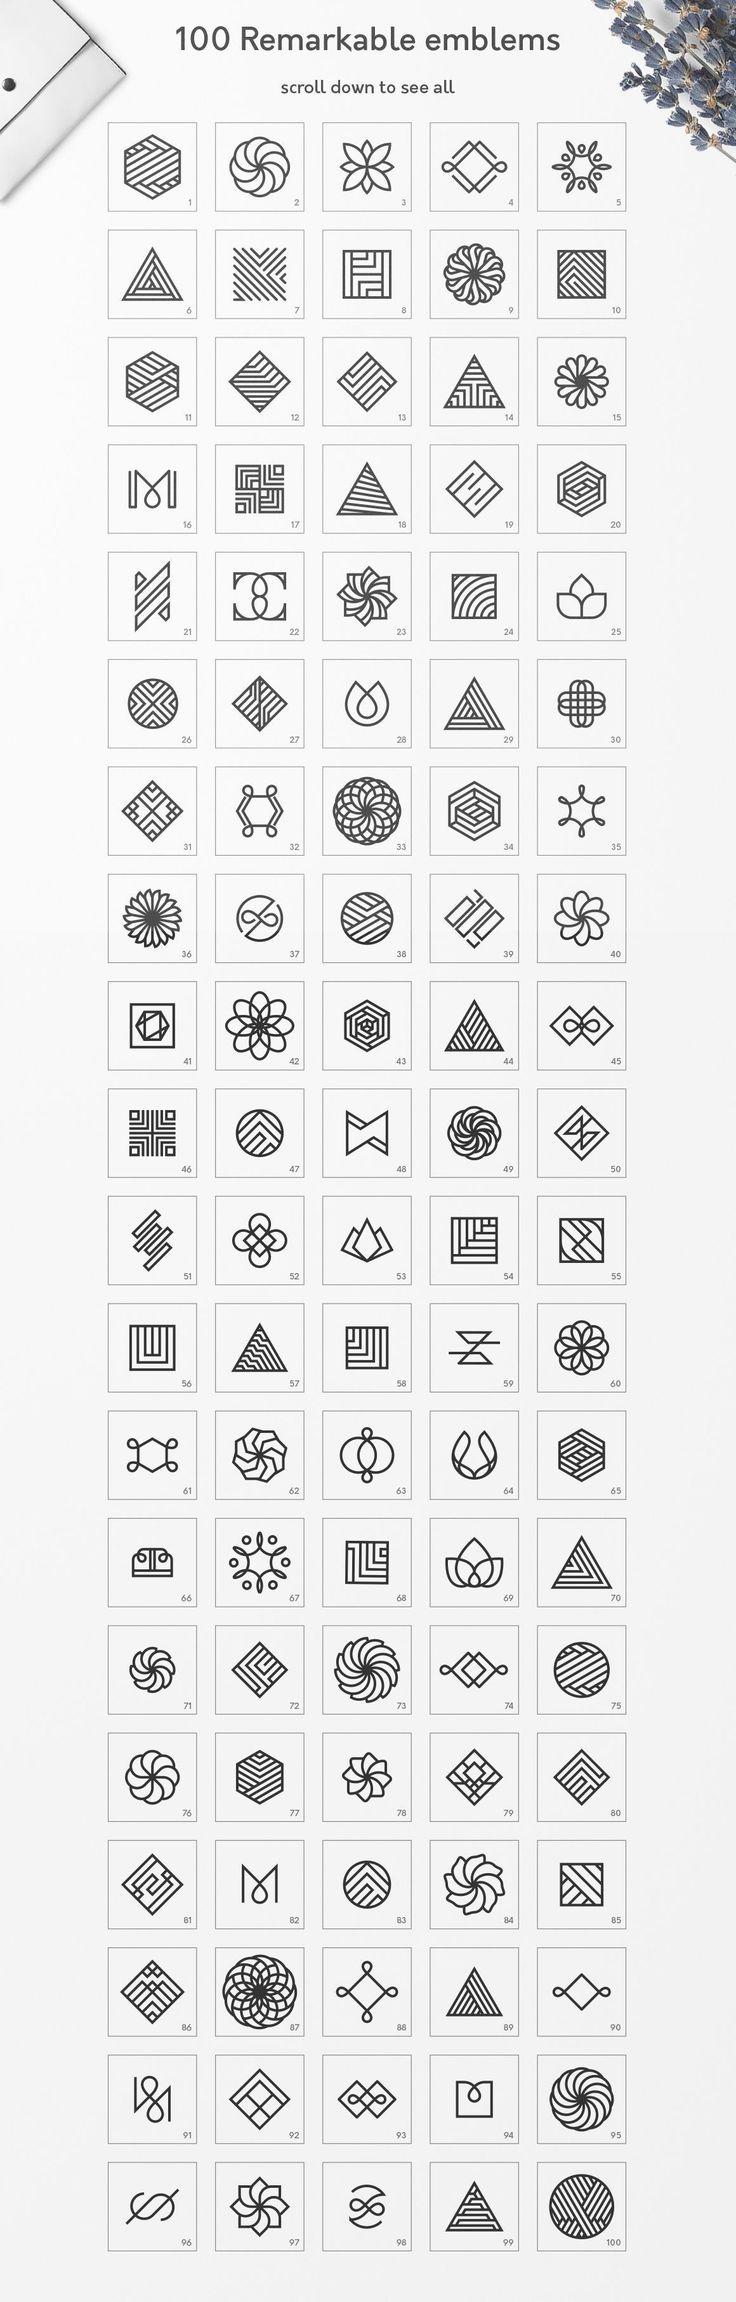 13 Best Semiotics Images On Pinterest Geometric Tattoos Tattoo